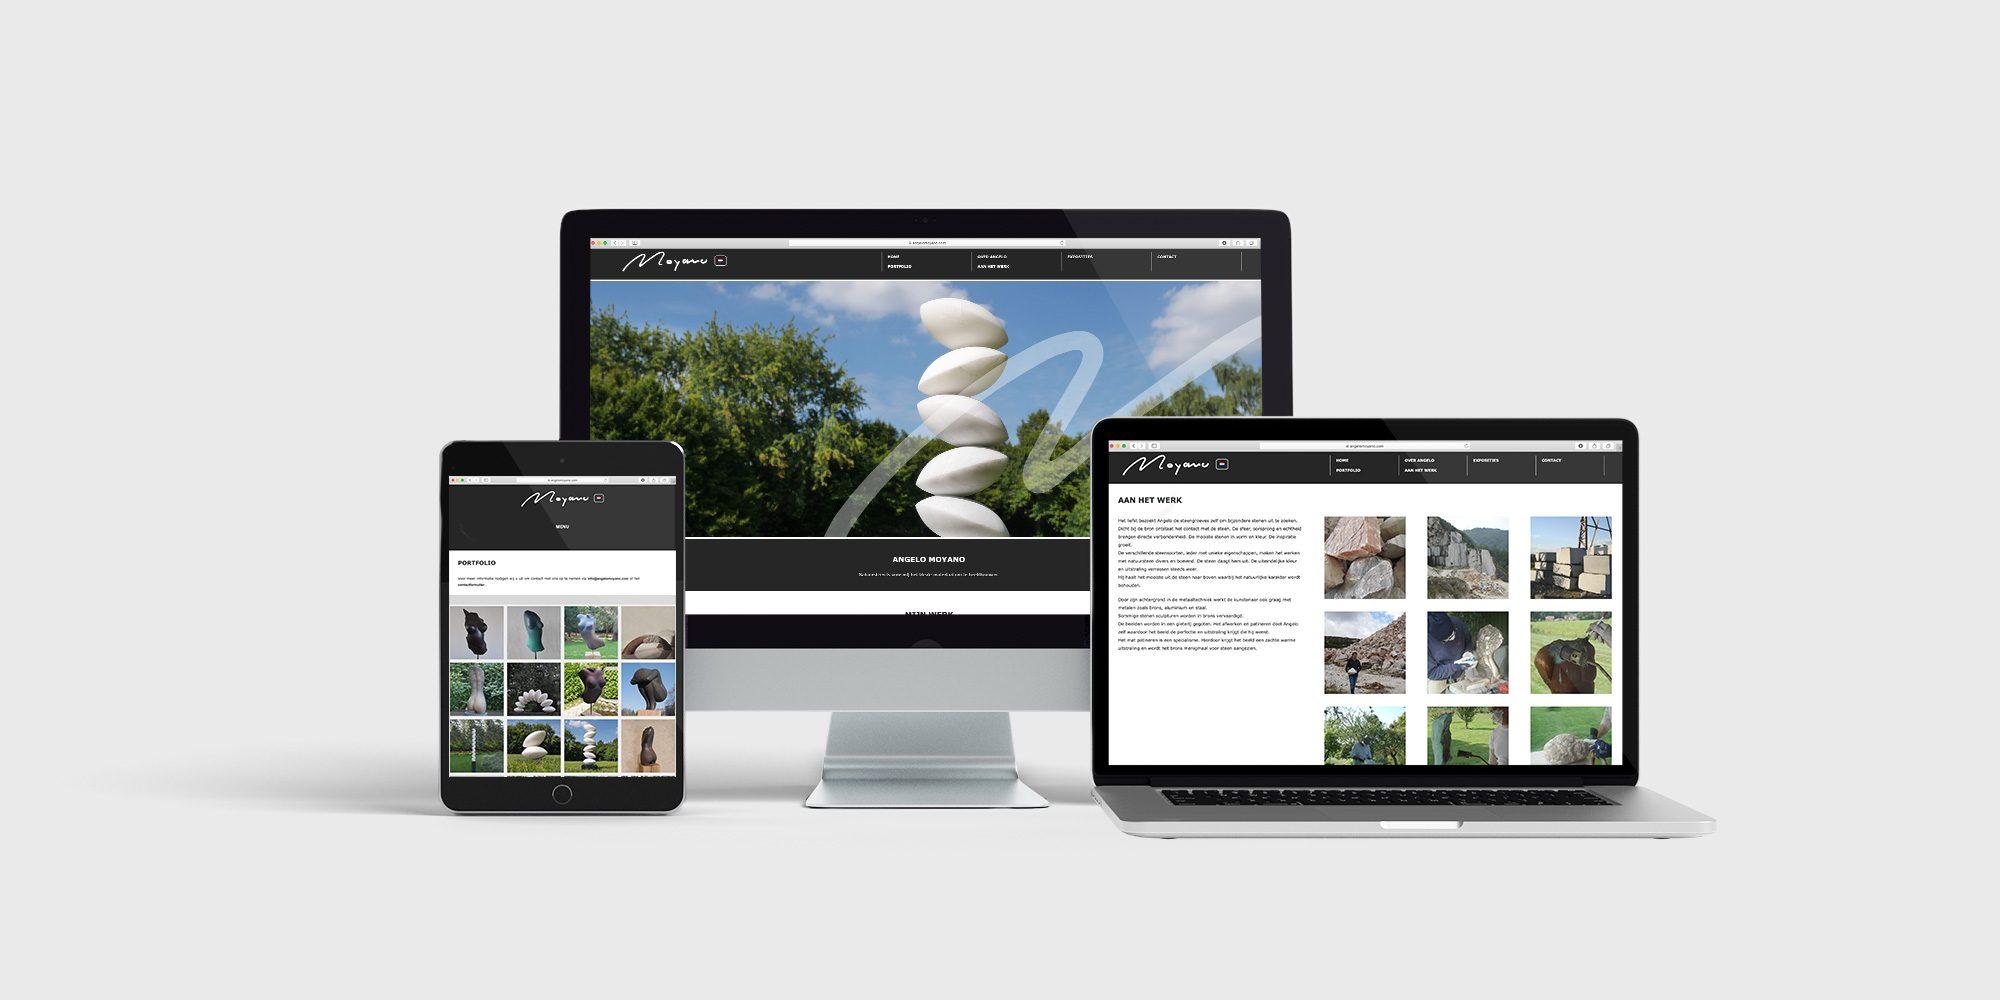 WordPress CMS website Angelo Moyano